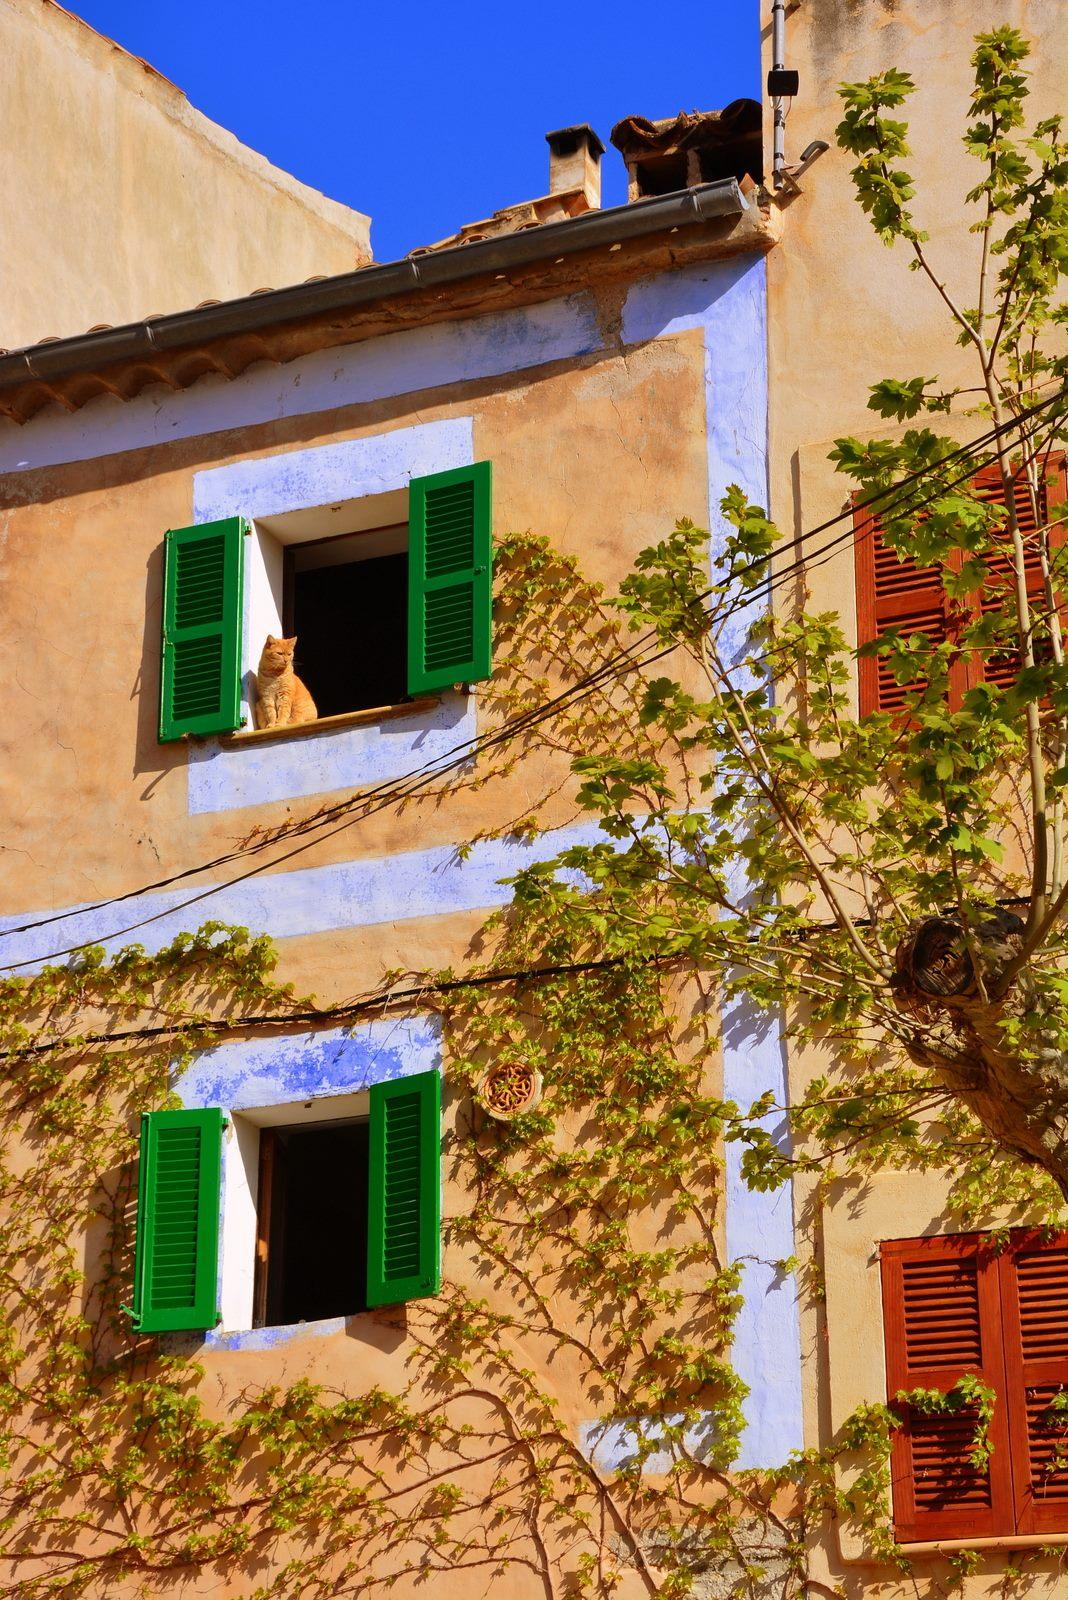 Mein perfektes Mallorca Wochenende staedtereisen sonne land und leute mallorca familie europa  tui berlin mallorca estellencs banyalbufar